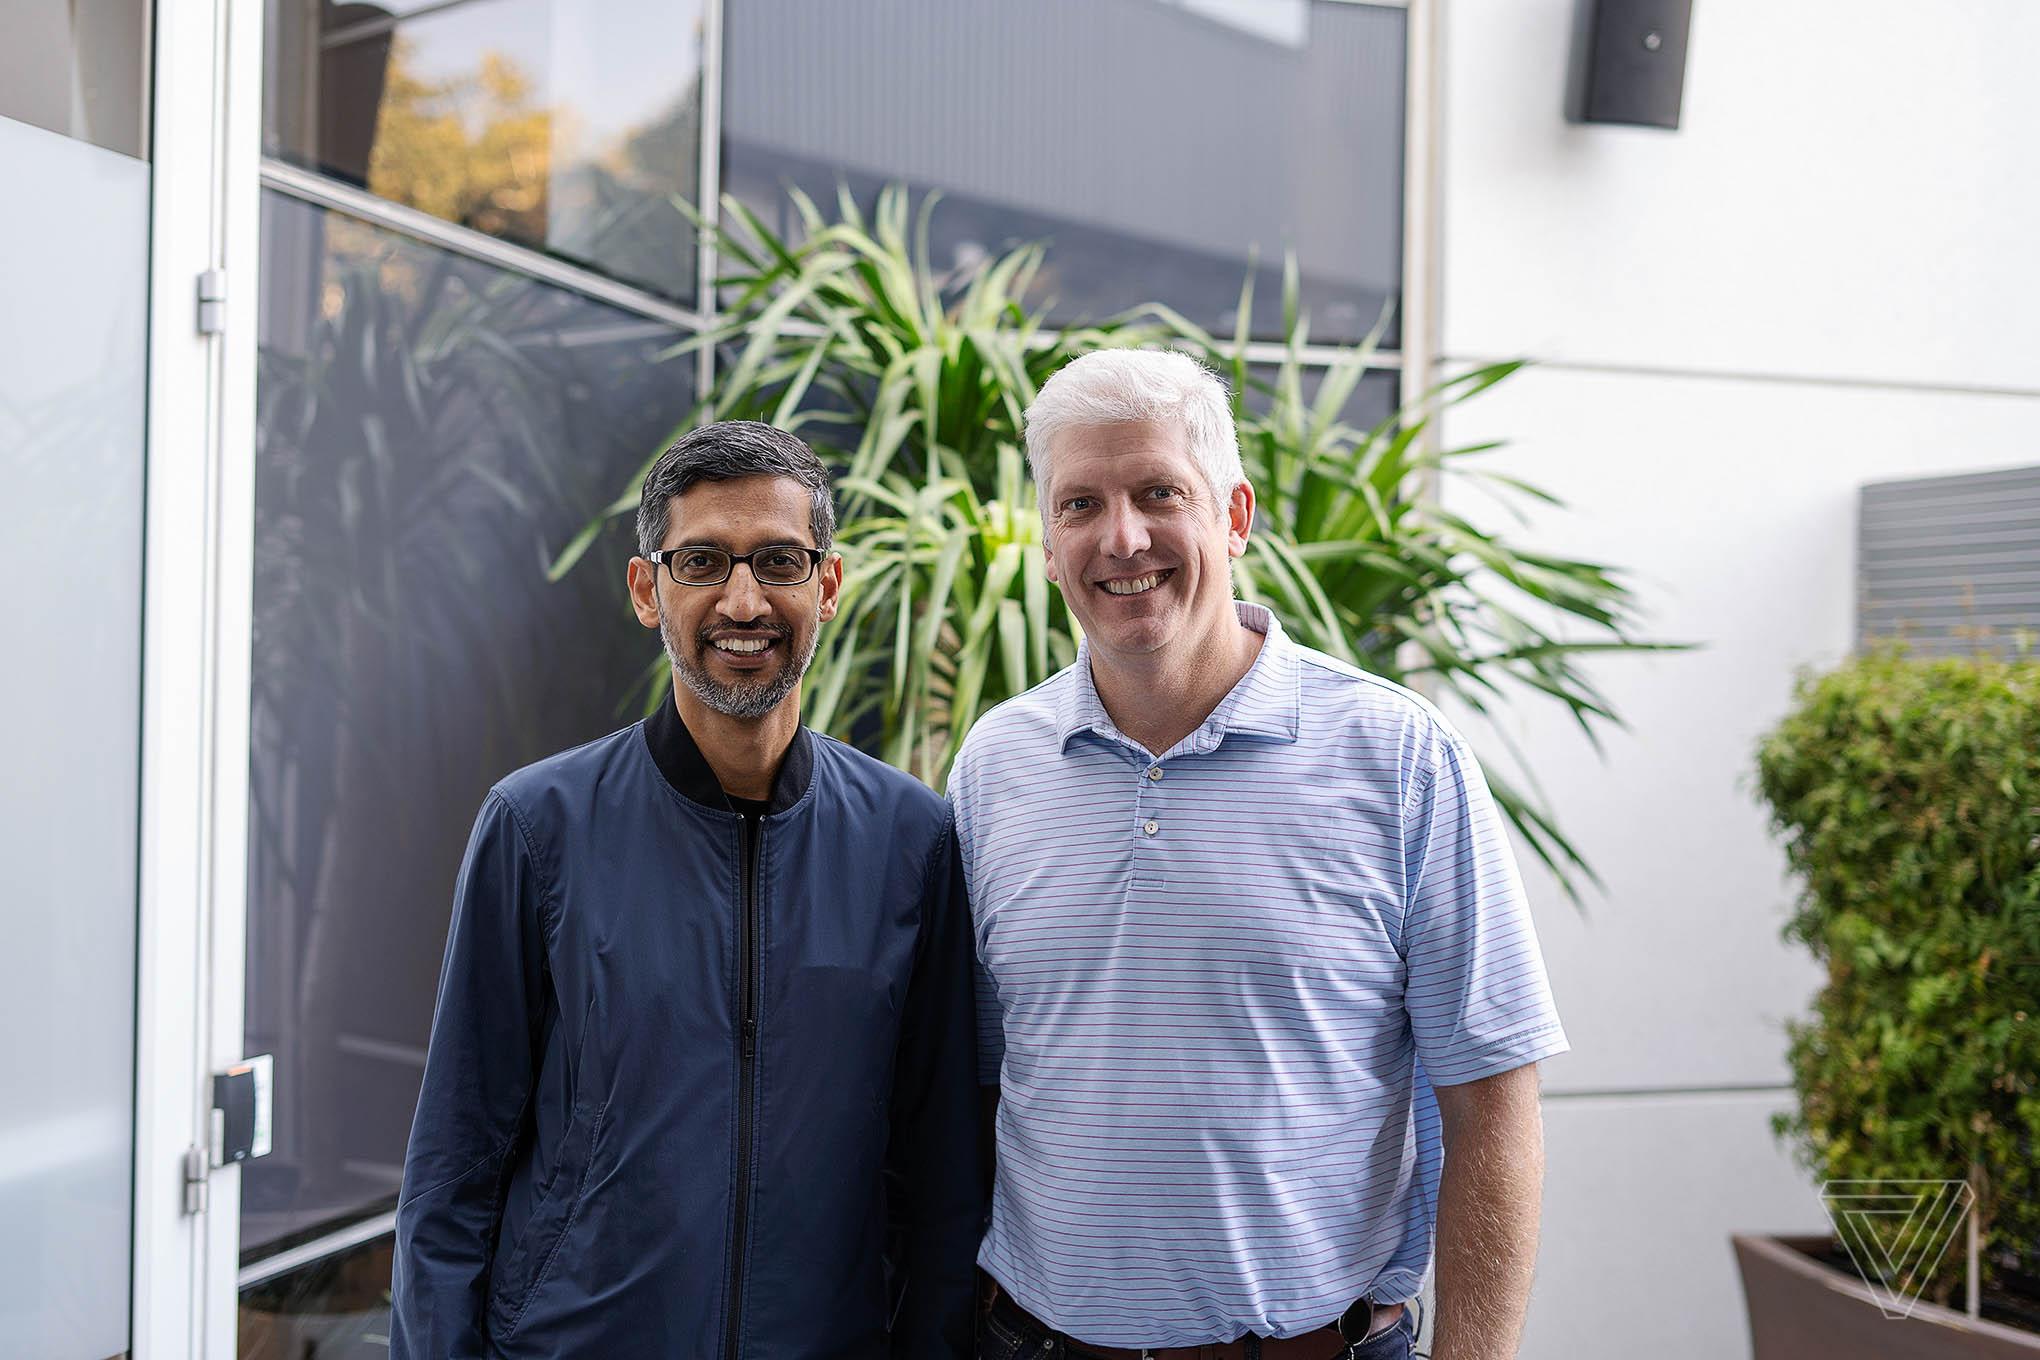 Sundar Pichai (left) and Rick Osterloh (right)